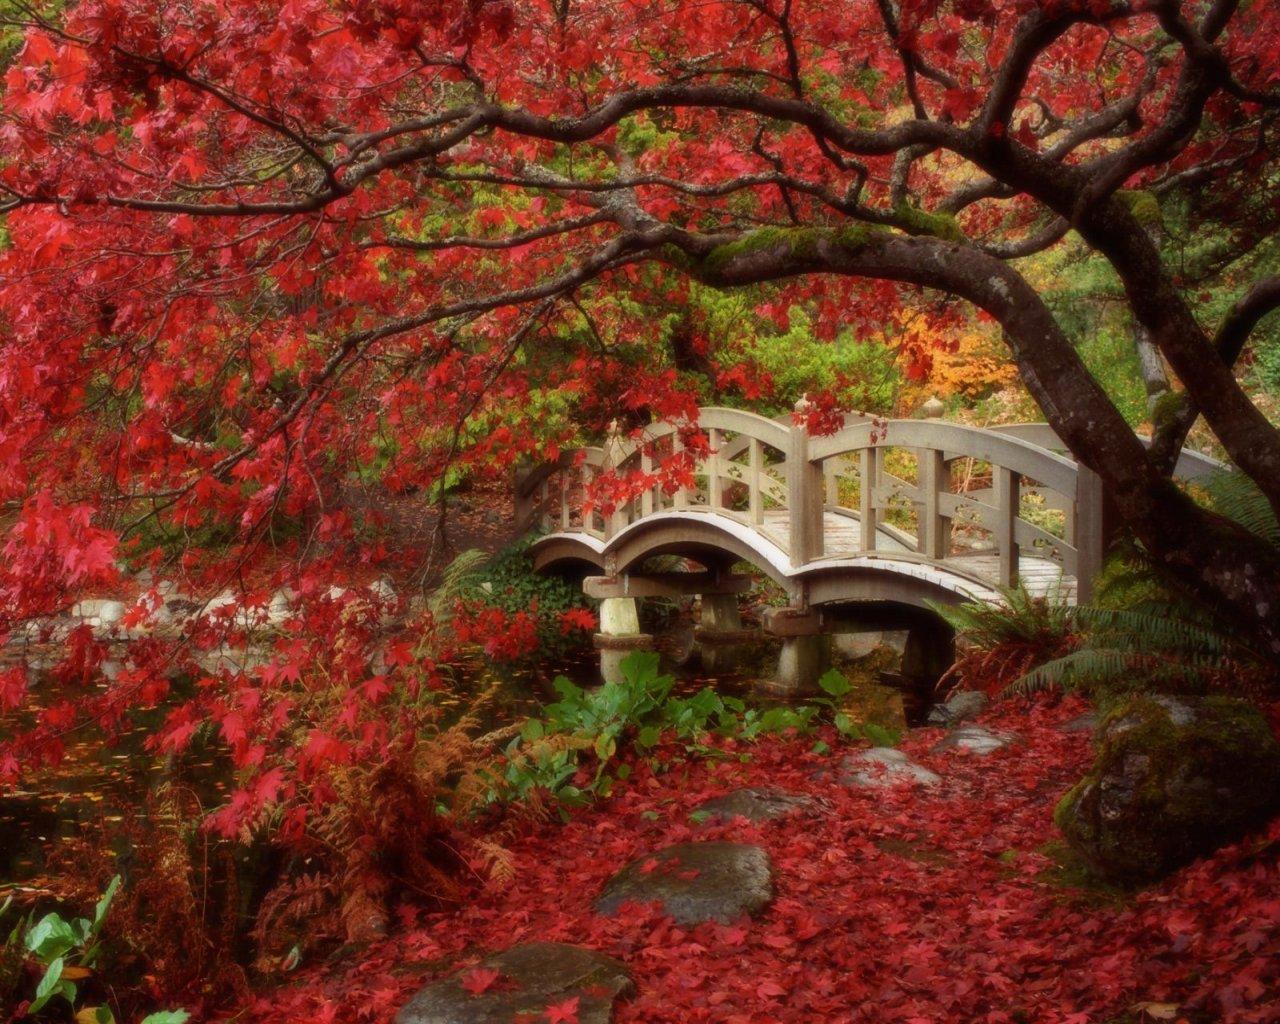 http://3.bp.blogspot.com/_Se-QKUZ5e80/S-L8Bu3oEnI/AAAAAAAAAAs/vMAOYej71-0/s1600/jardin_japones.jpg